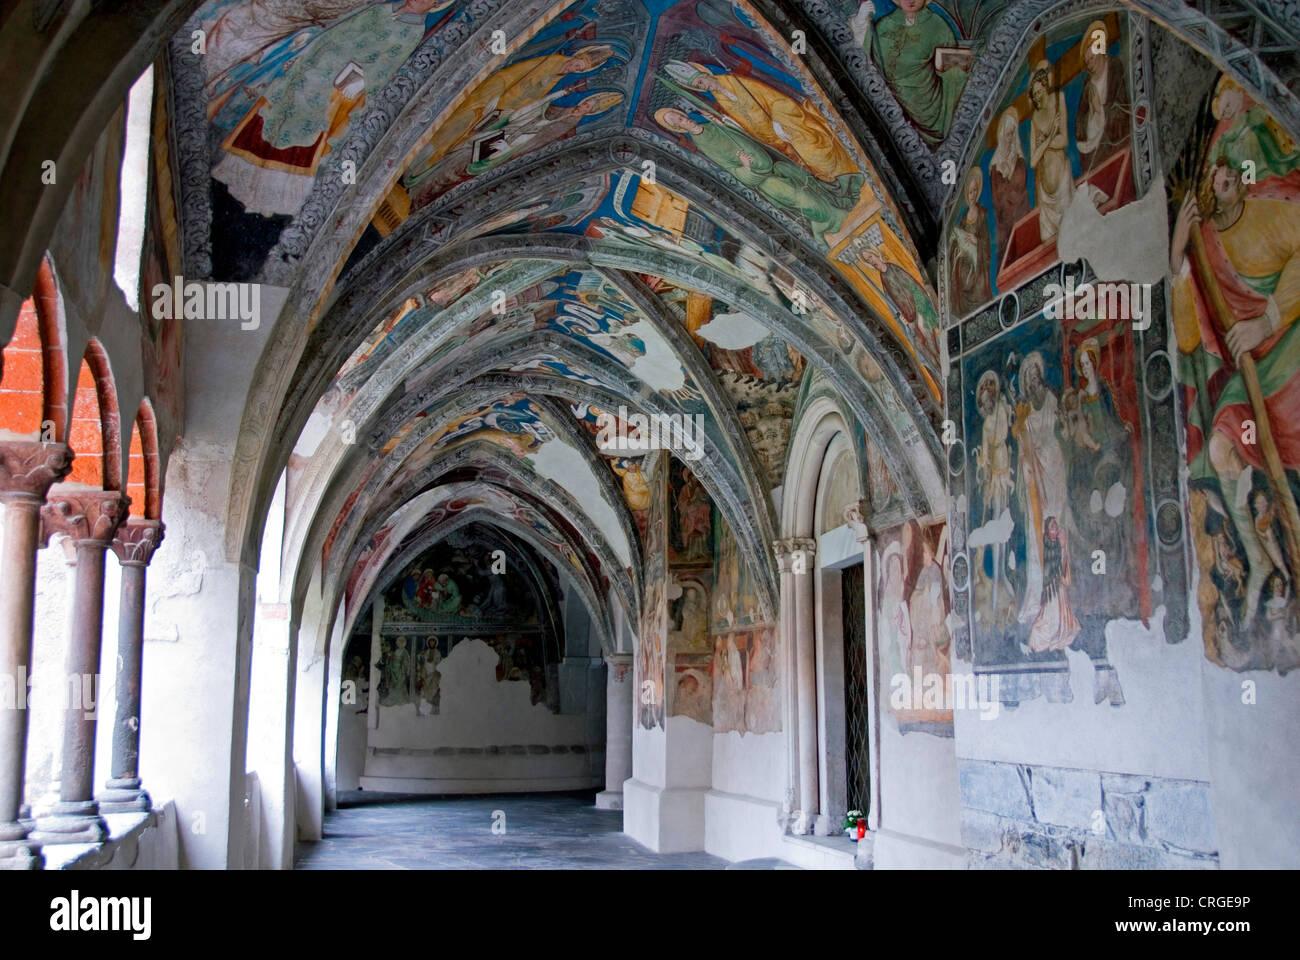 cross-coat, arcades, Italy, Trentino-Suedtirol, Brixen - Stock Image